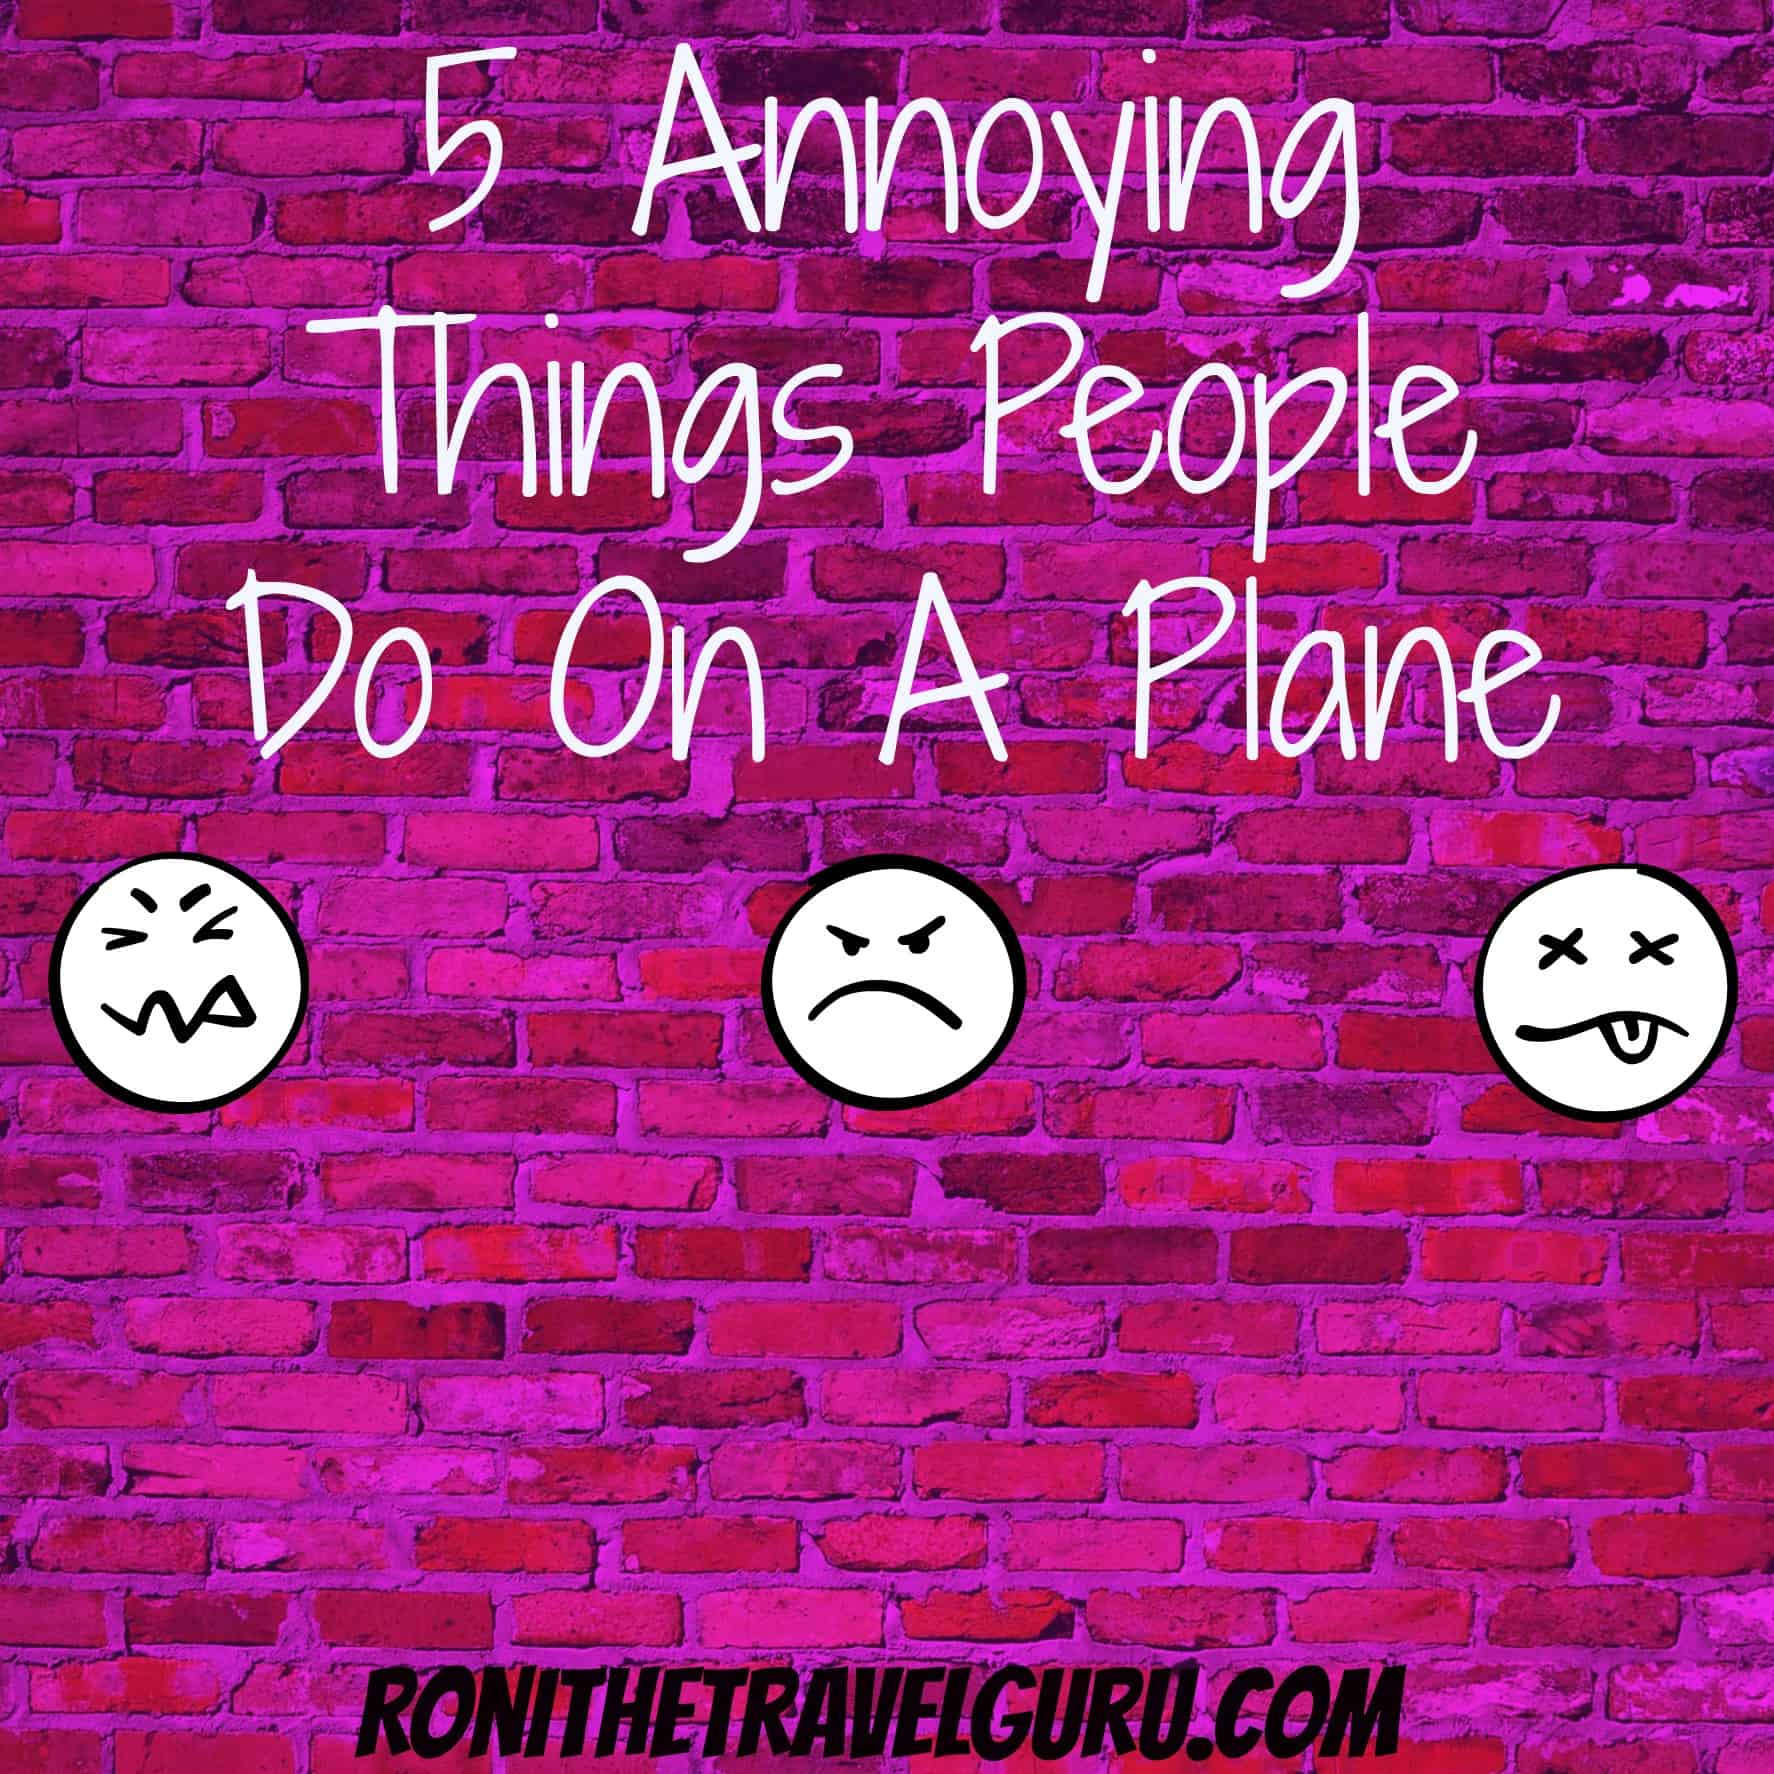 5annoyingthings